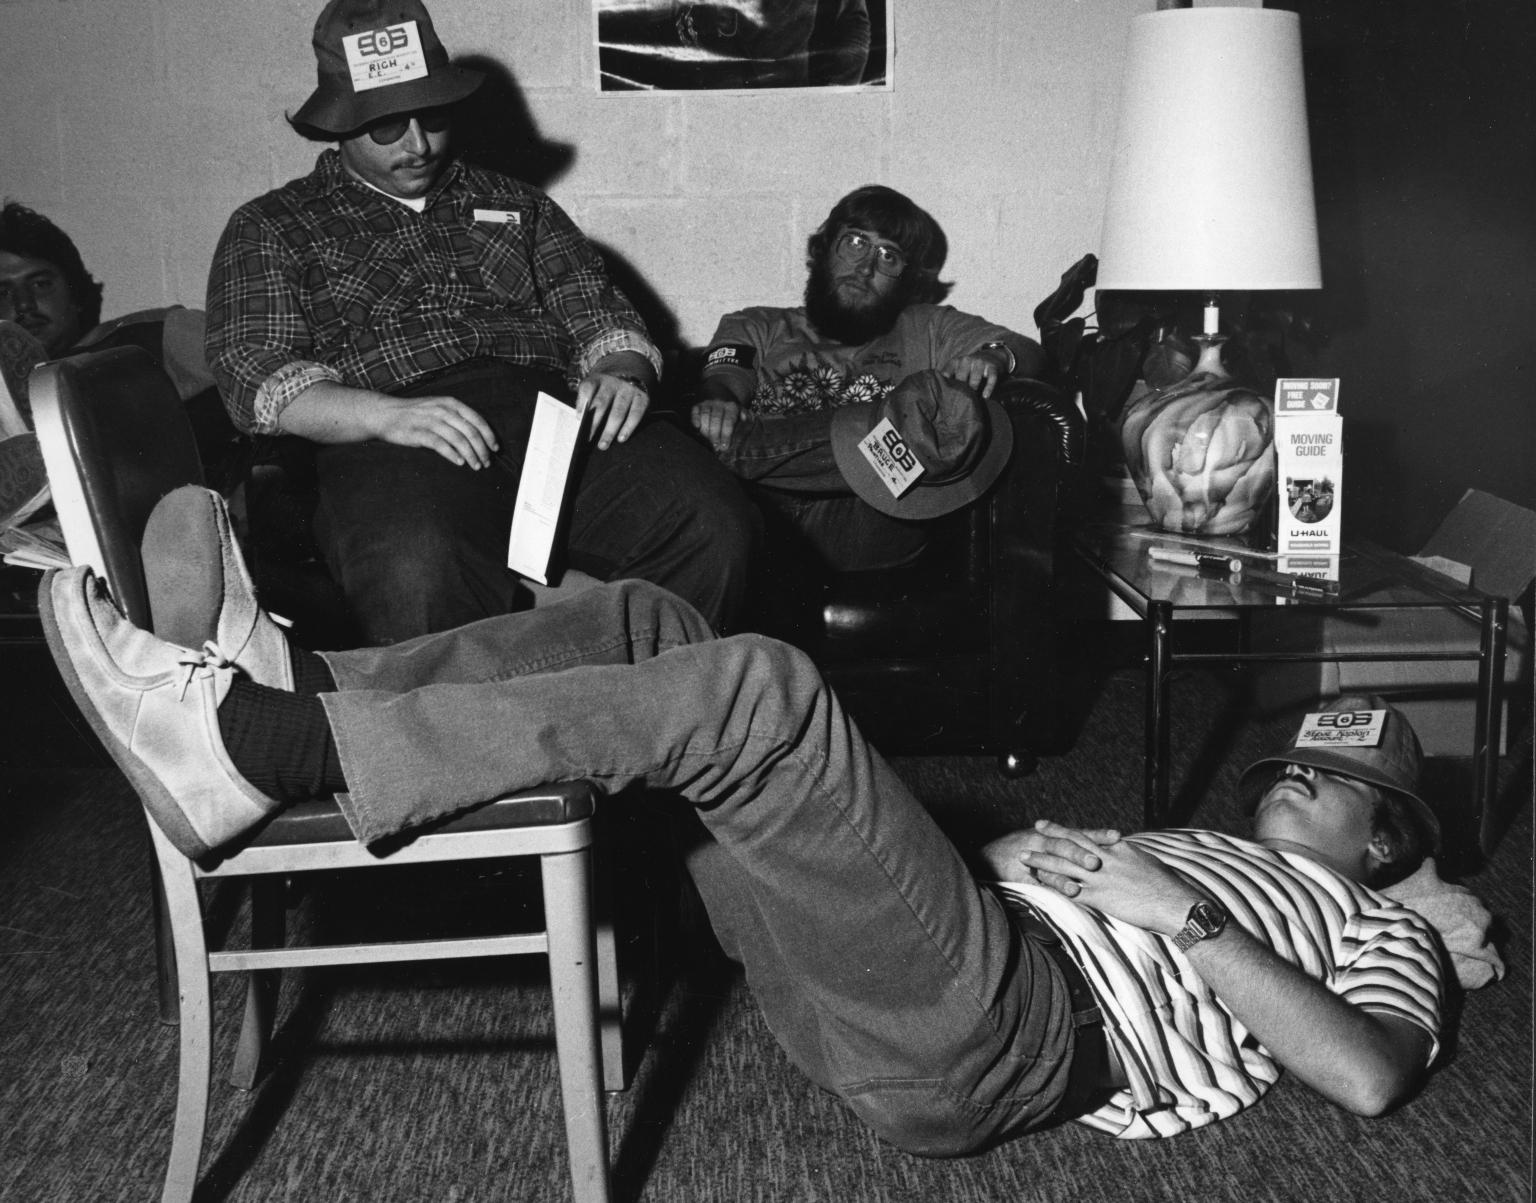 Student Orientation, SOS Committee Members Relaxing